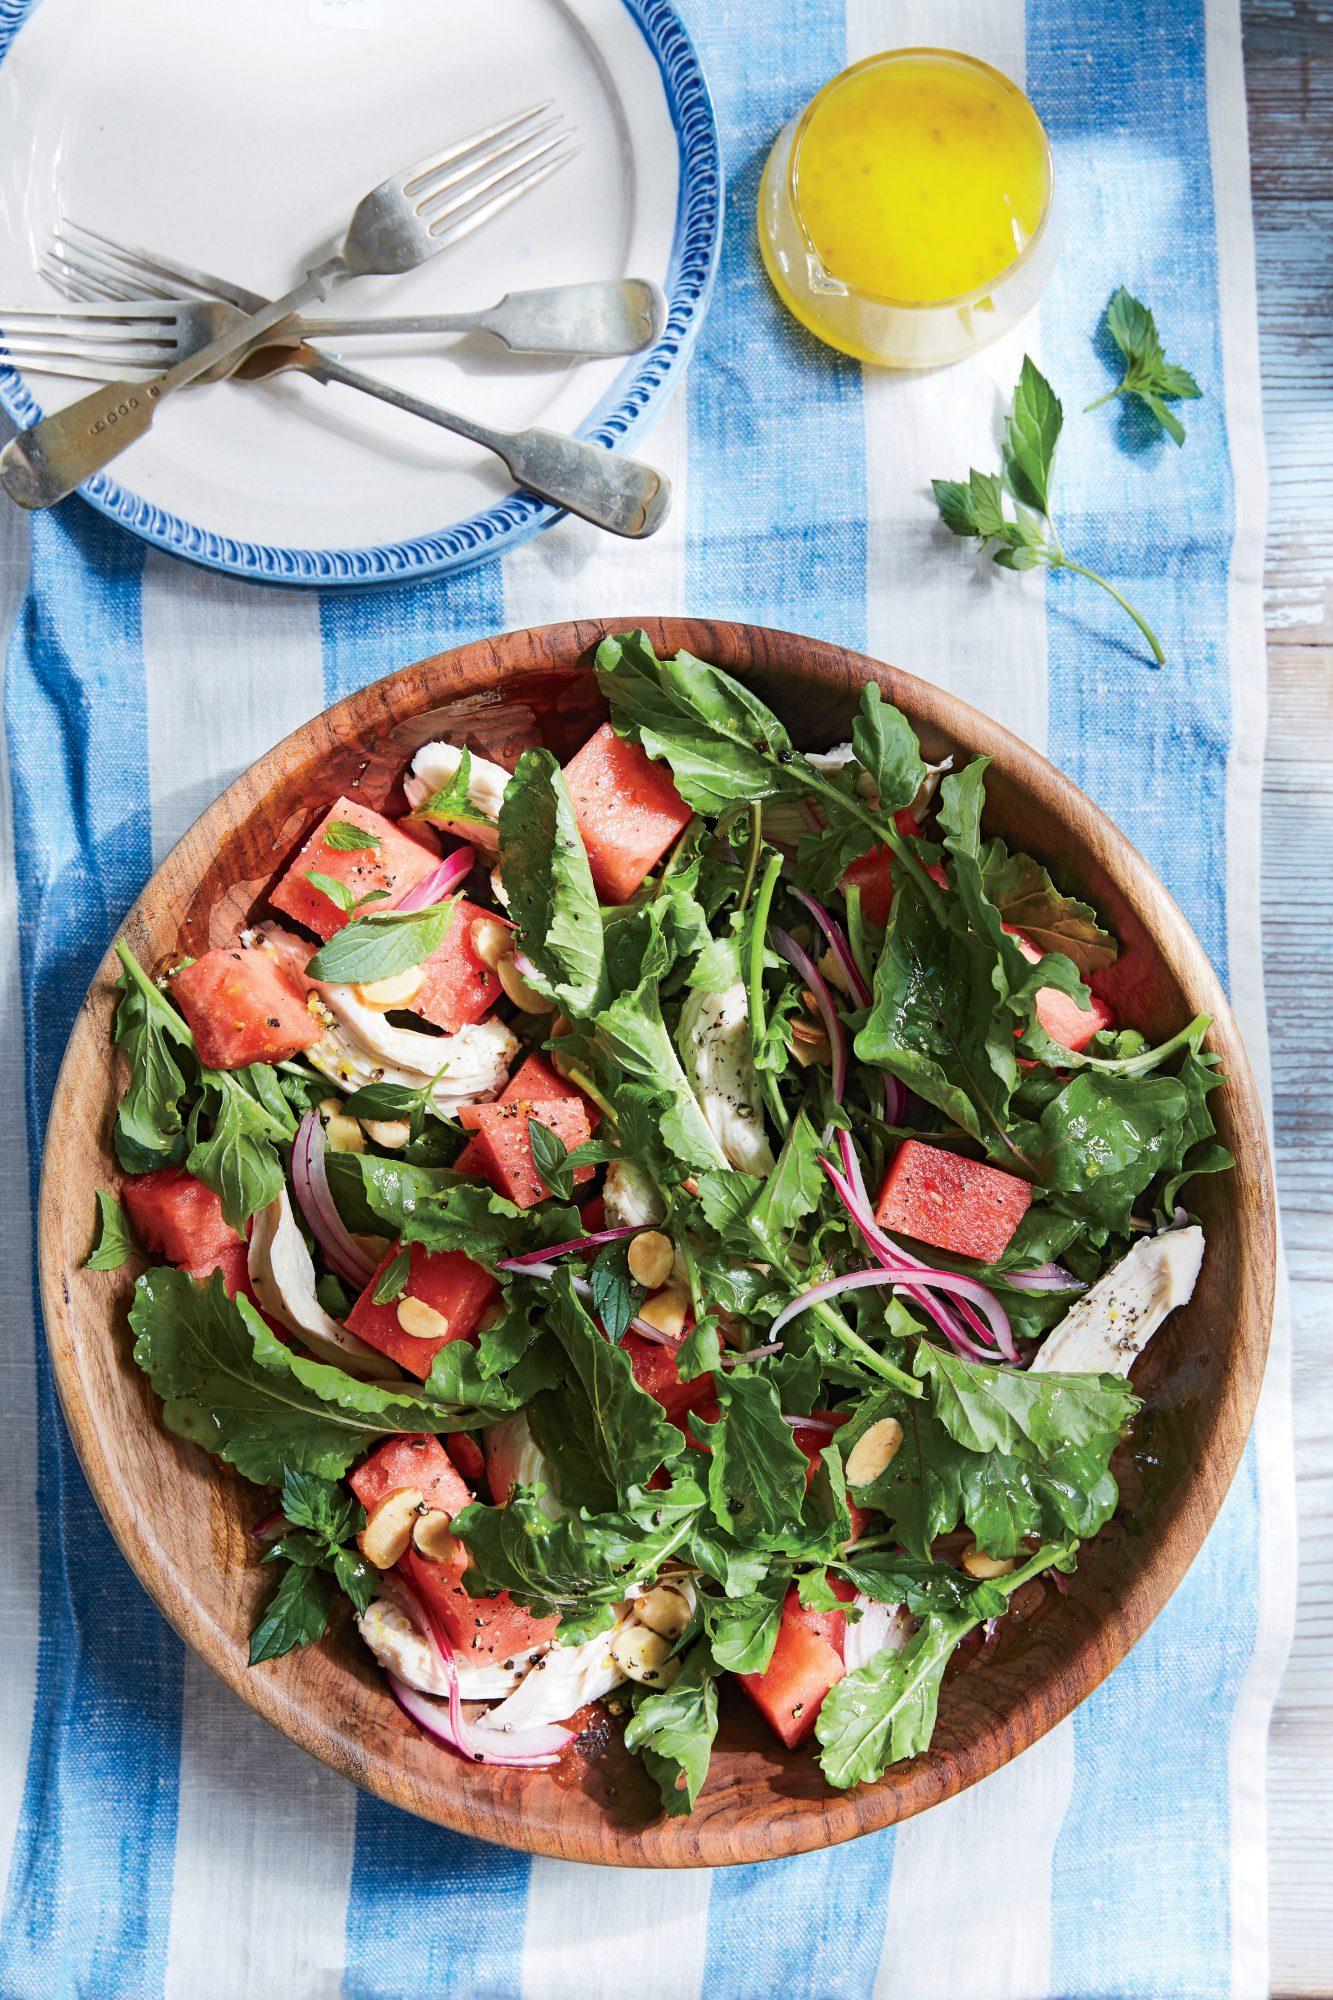 Watermelon and Arugula Chicken Salad